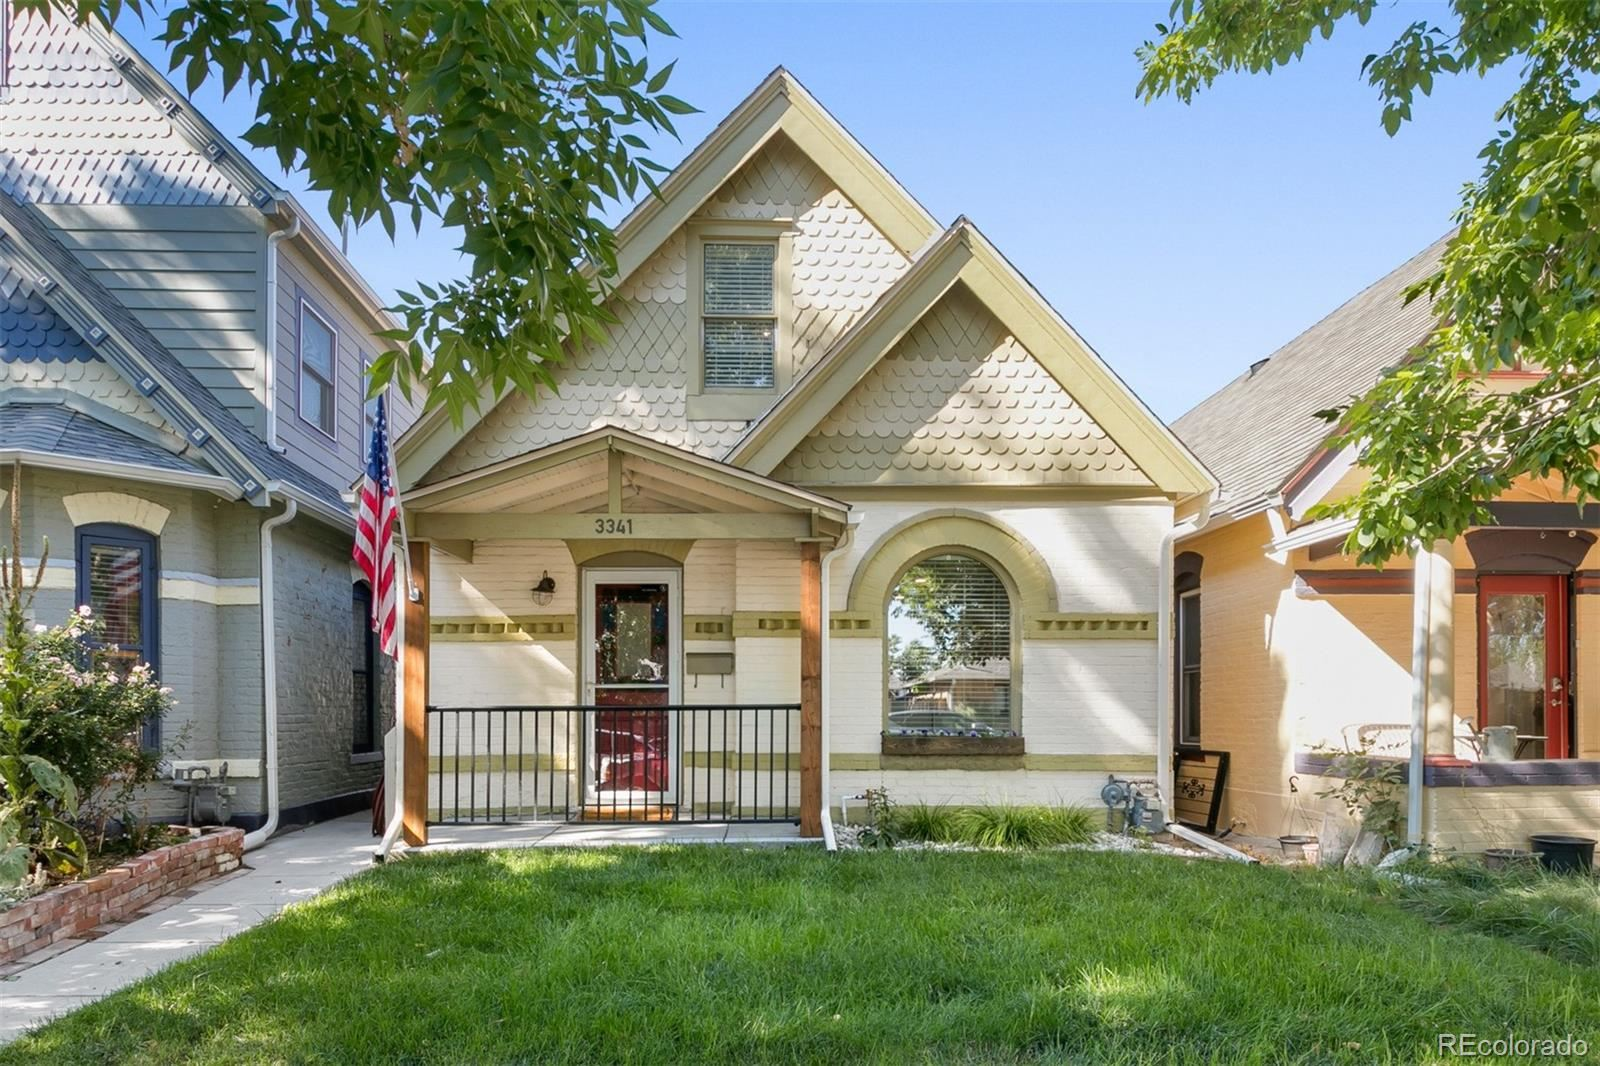 3341 W 33rd Avenue, Denver, CO 80211 - #: 5595218